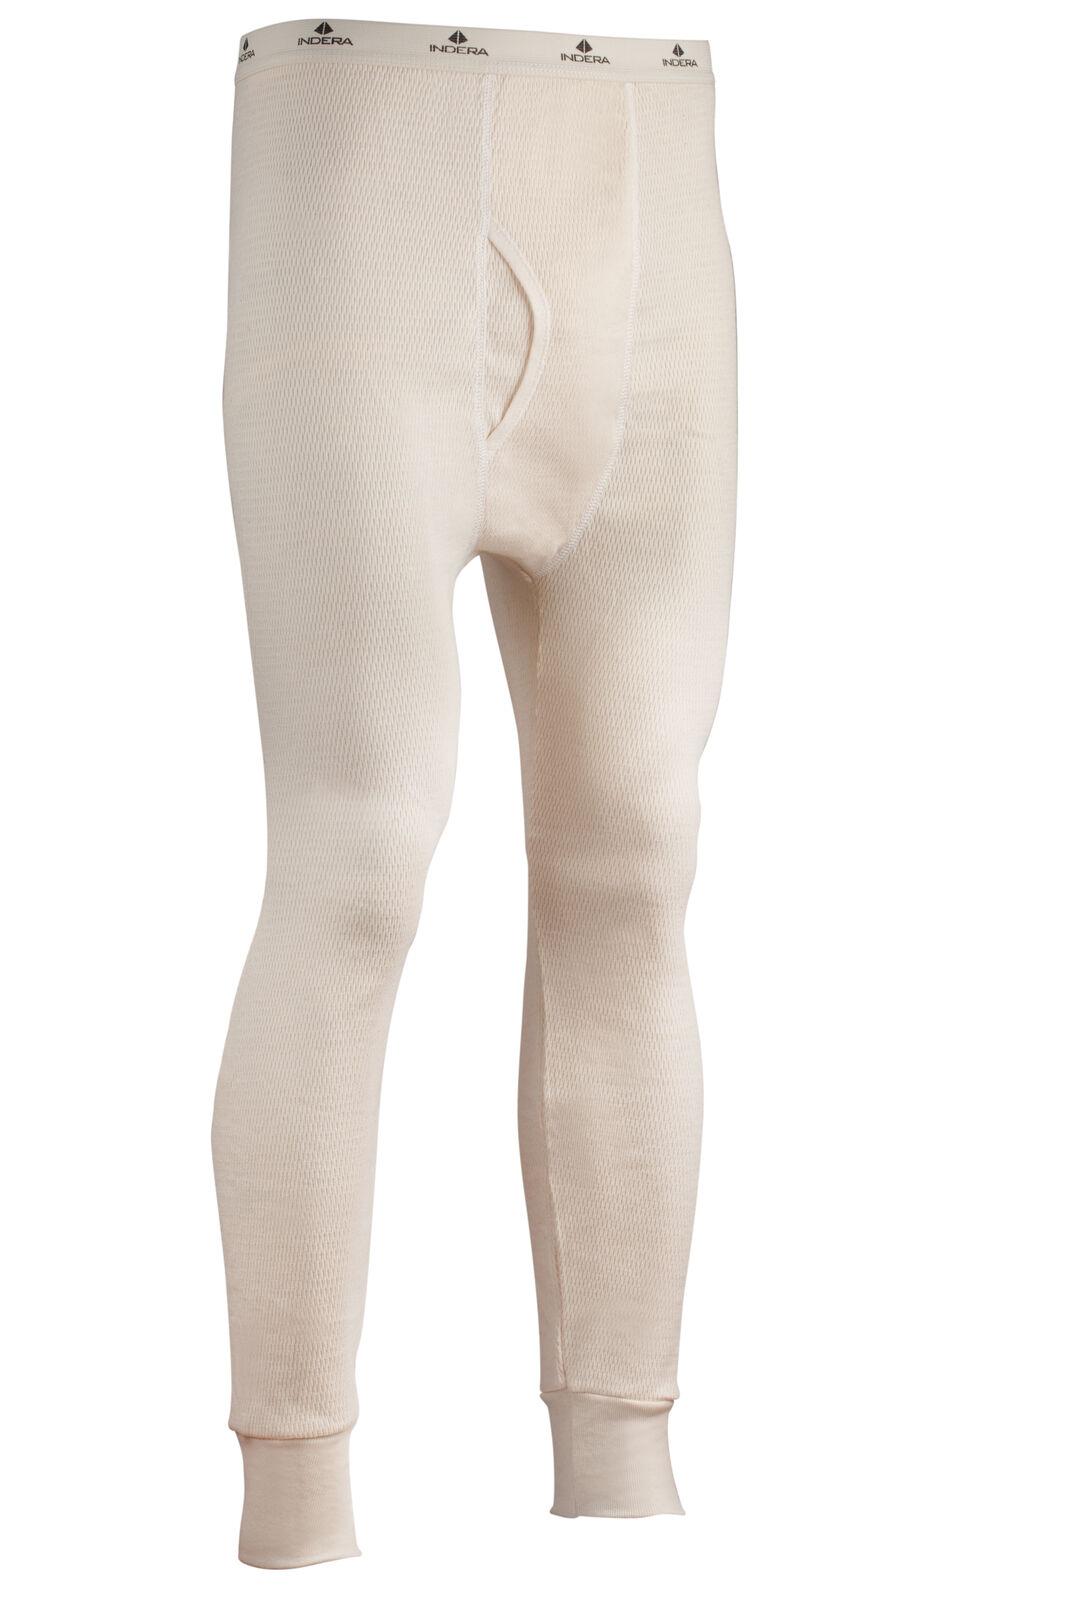 Indera Mens Expedition Weight Cotton Raschel Knit Thermal Underwear Top